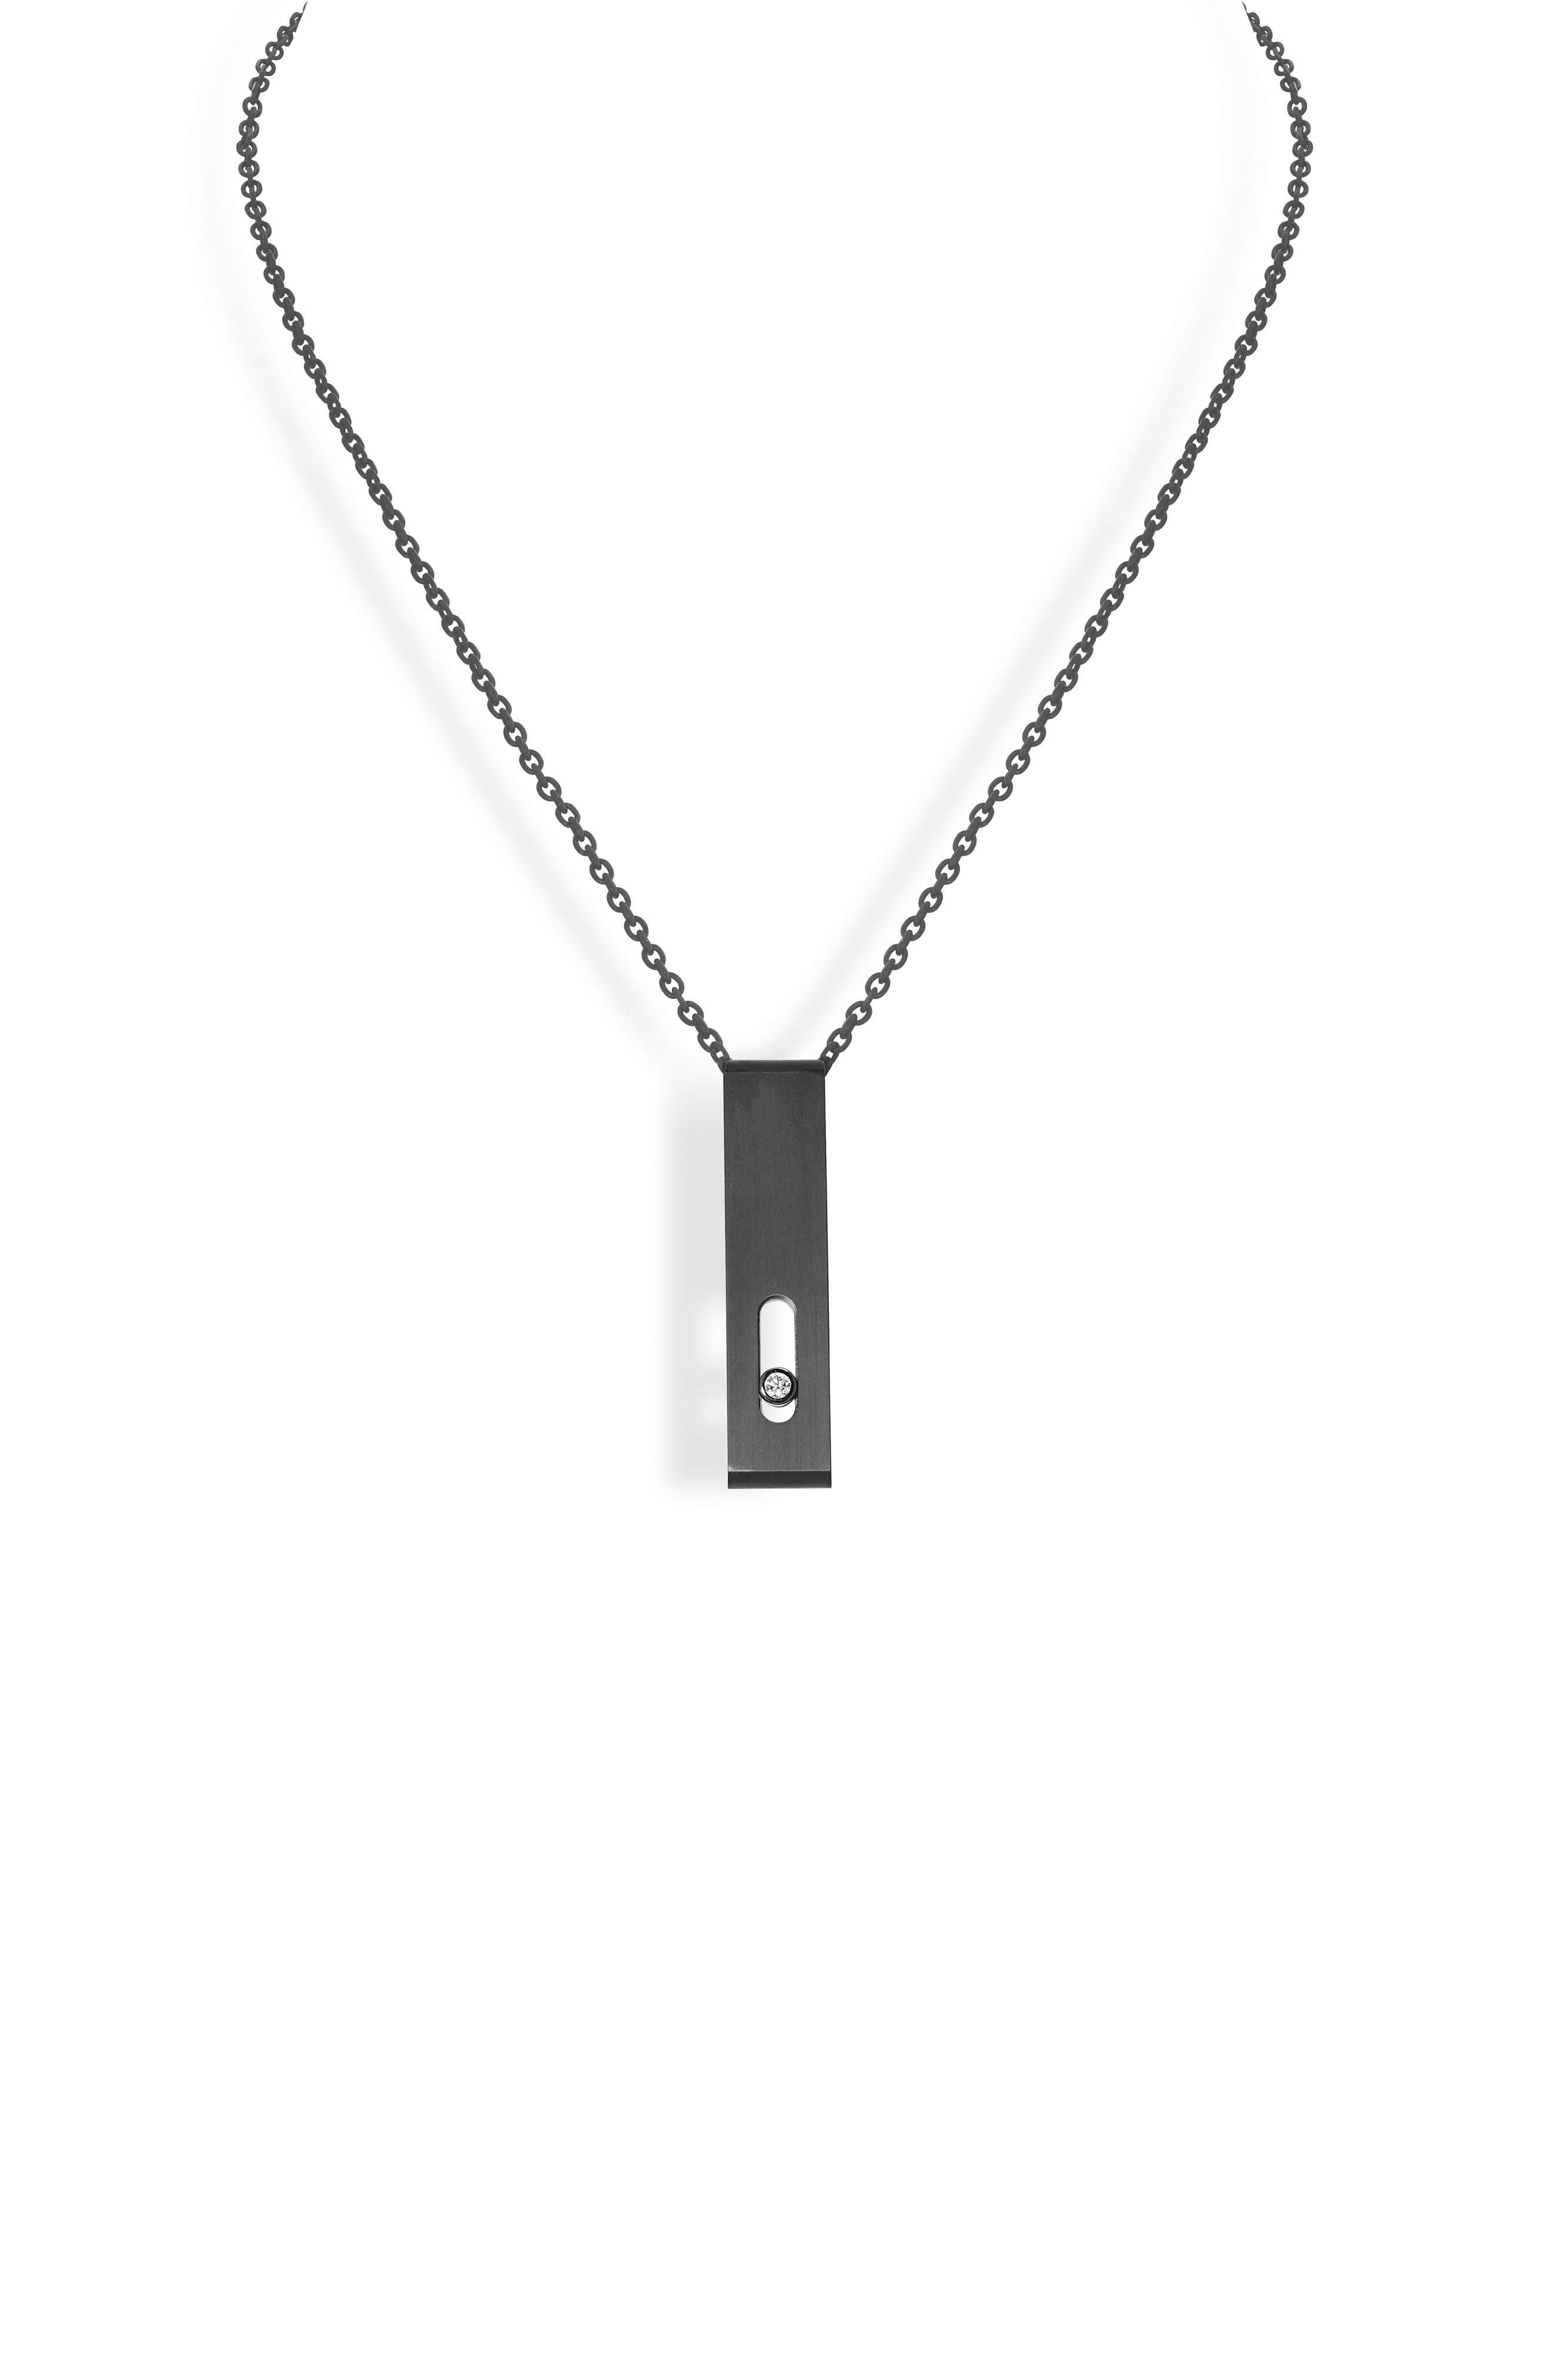 Titanium Move Diamond Pendant Necklace,                             Main thumbnail 1, color,                             025